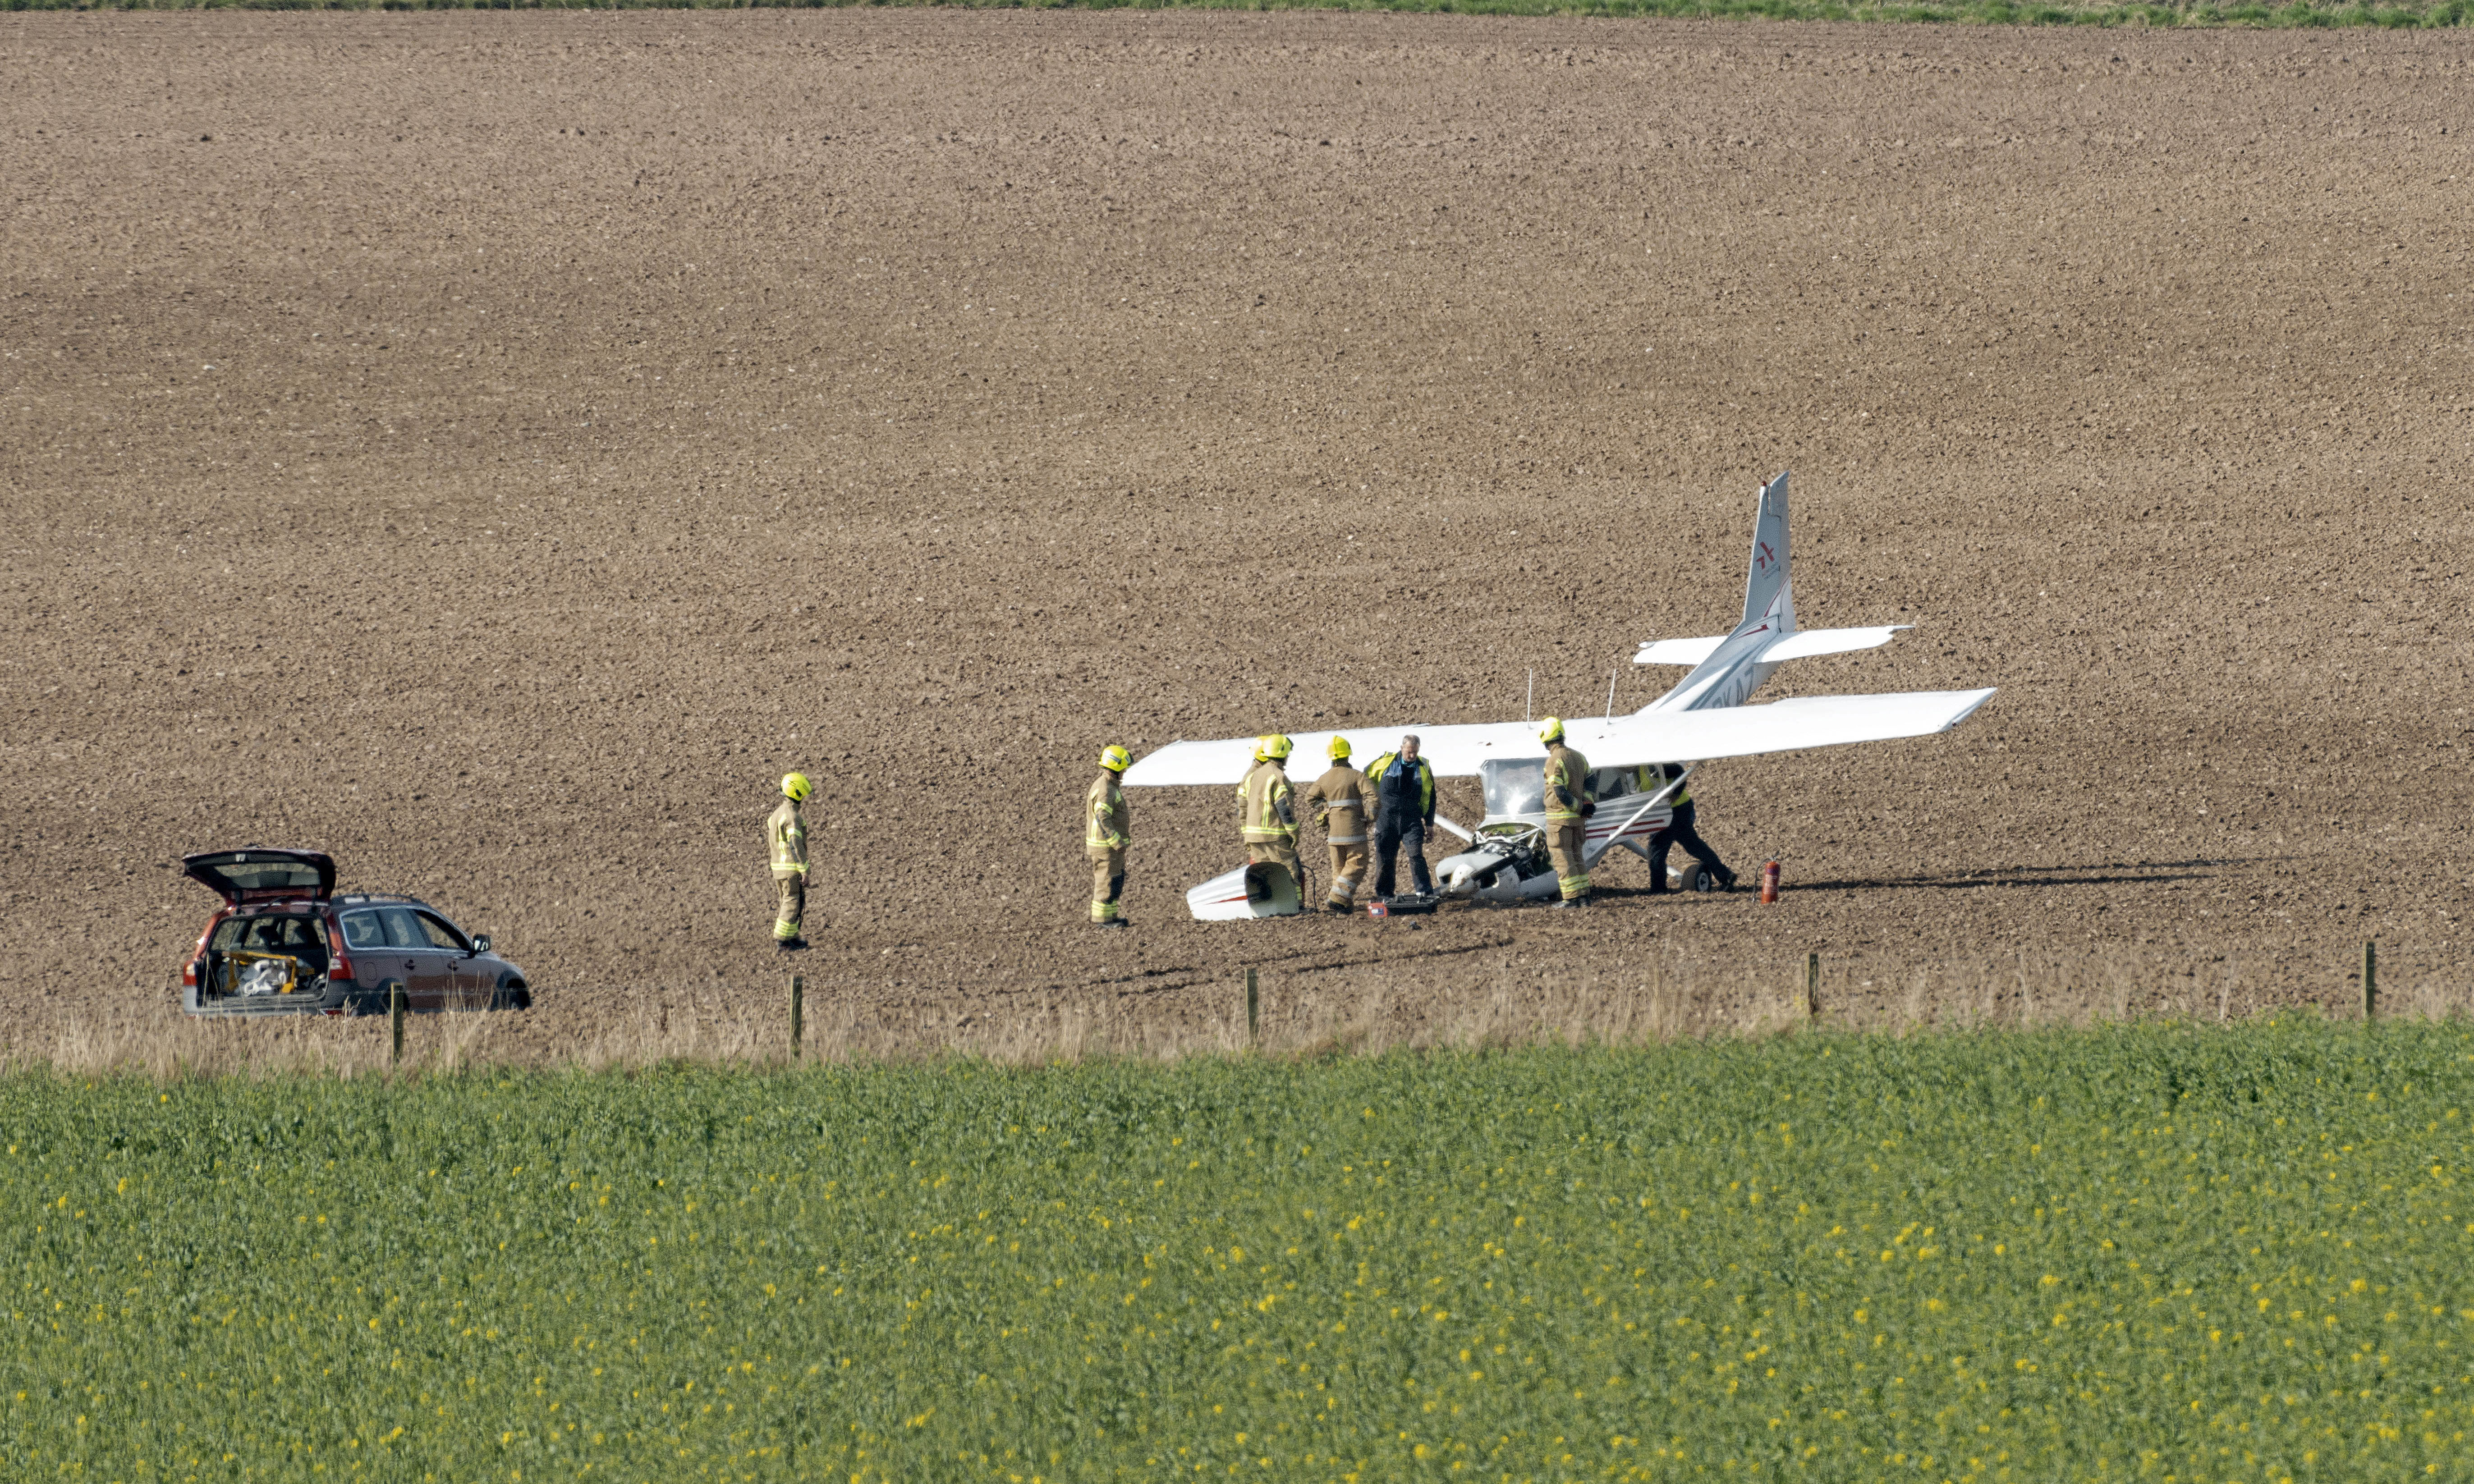 The plane at Kettings, near Coupar Angus